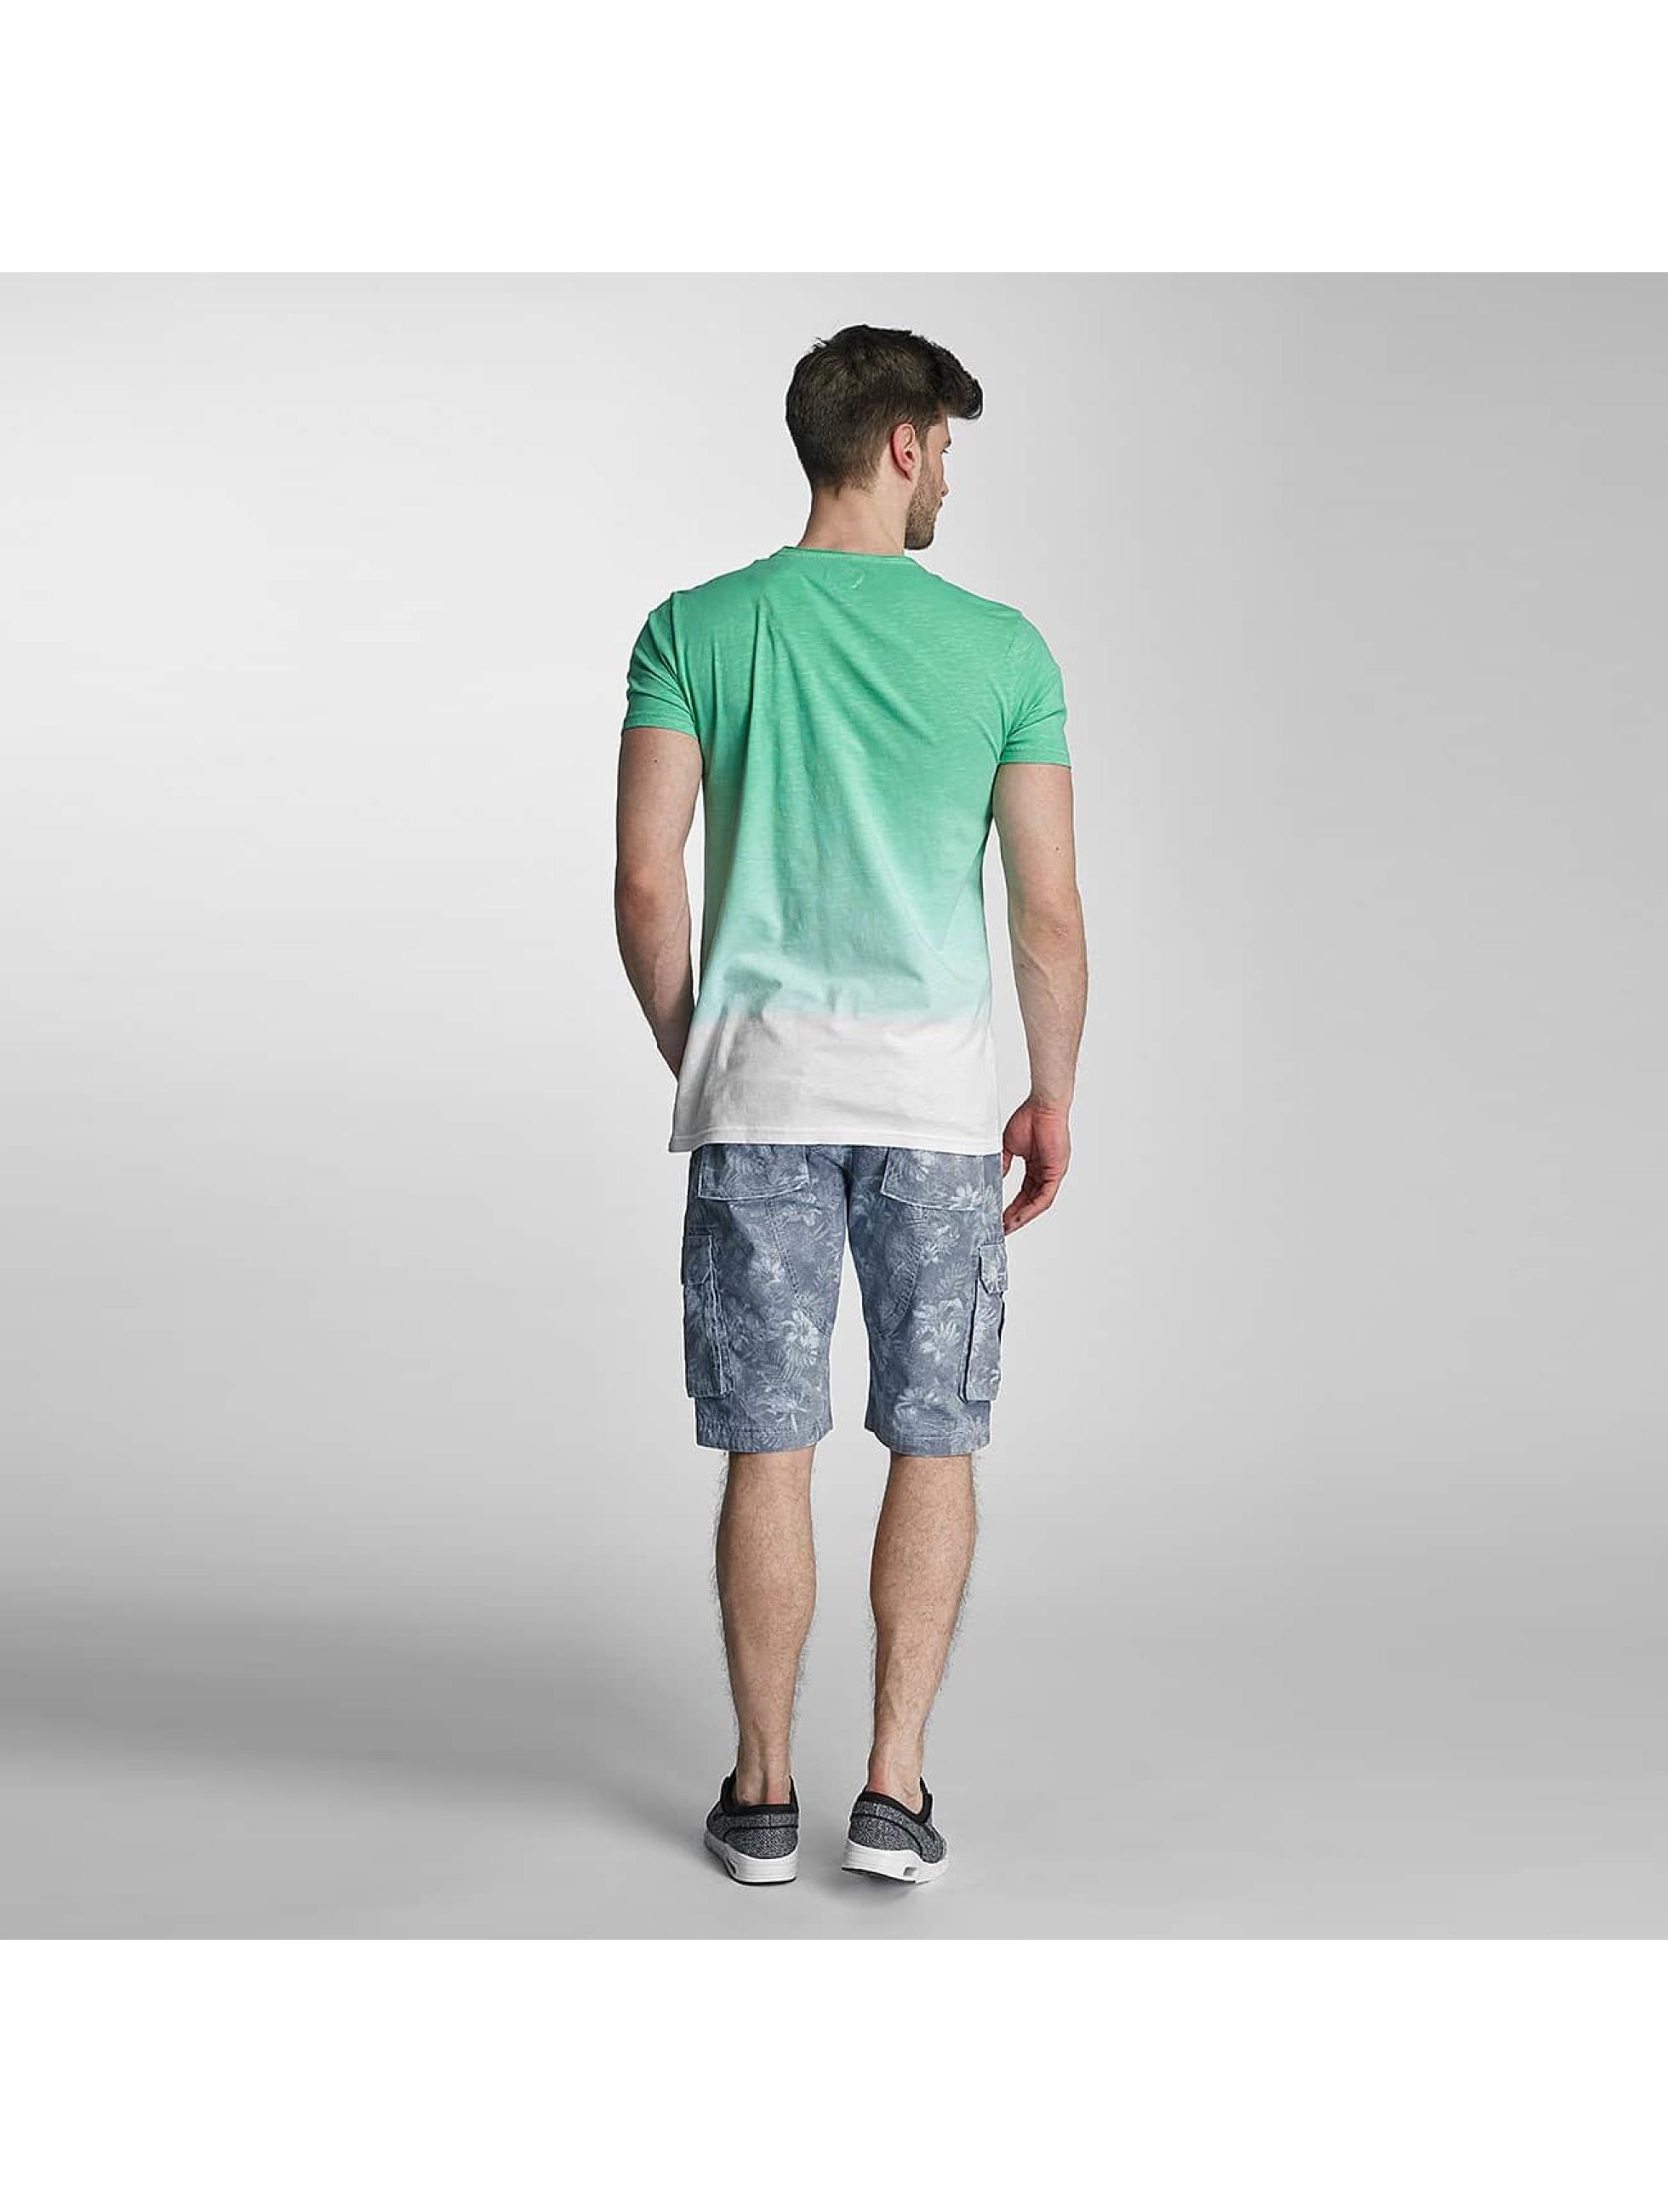 SHINE Original T-Shirt Dip Dyed grün